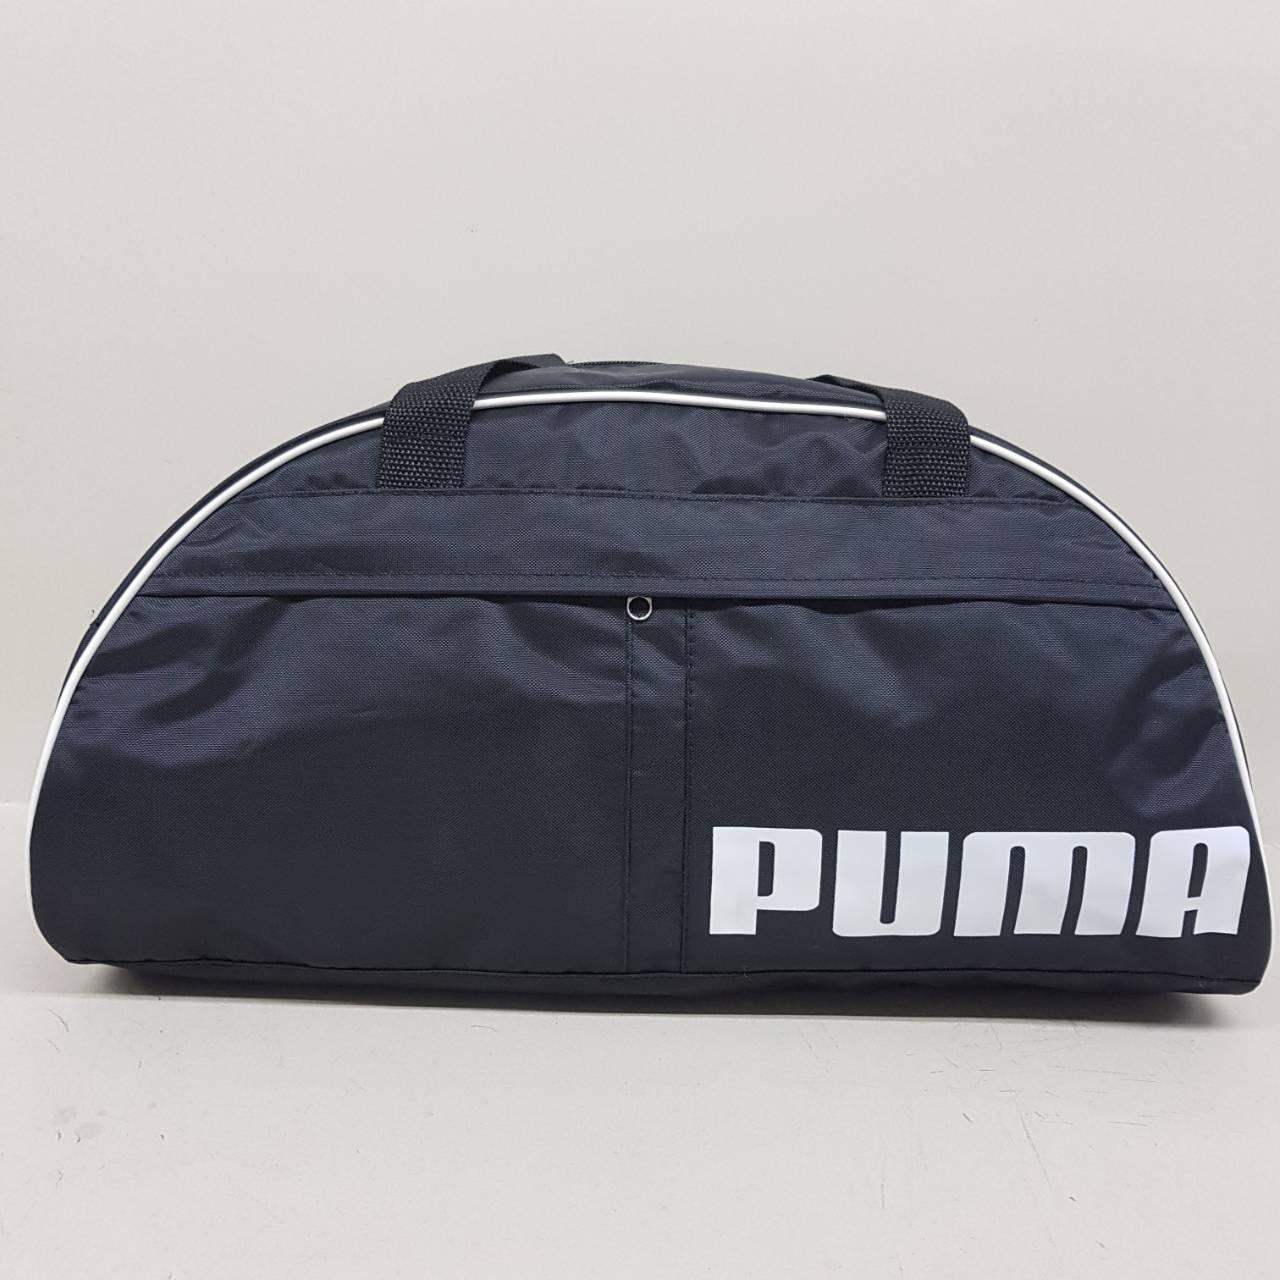 65167a1f Сумка спортивная Пума, Сумка для фитнеса оптом, унисекс, сумки недорого